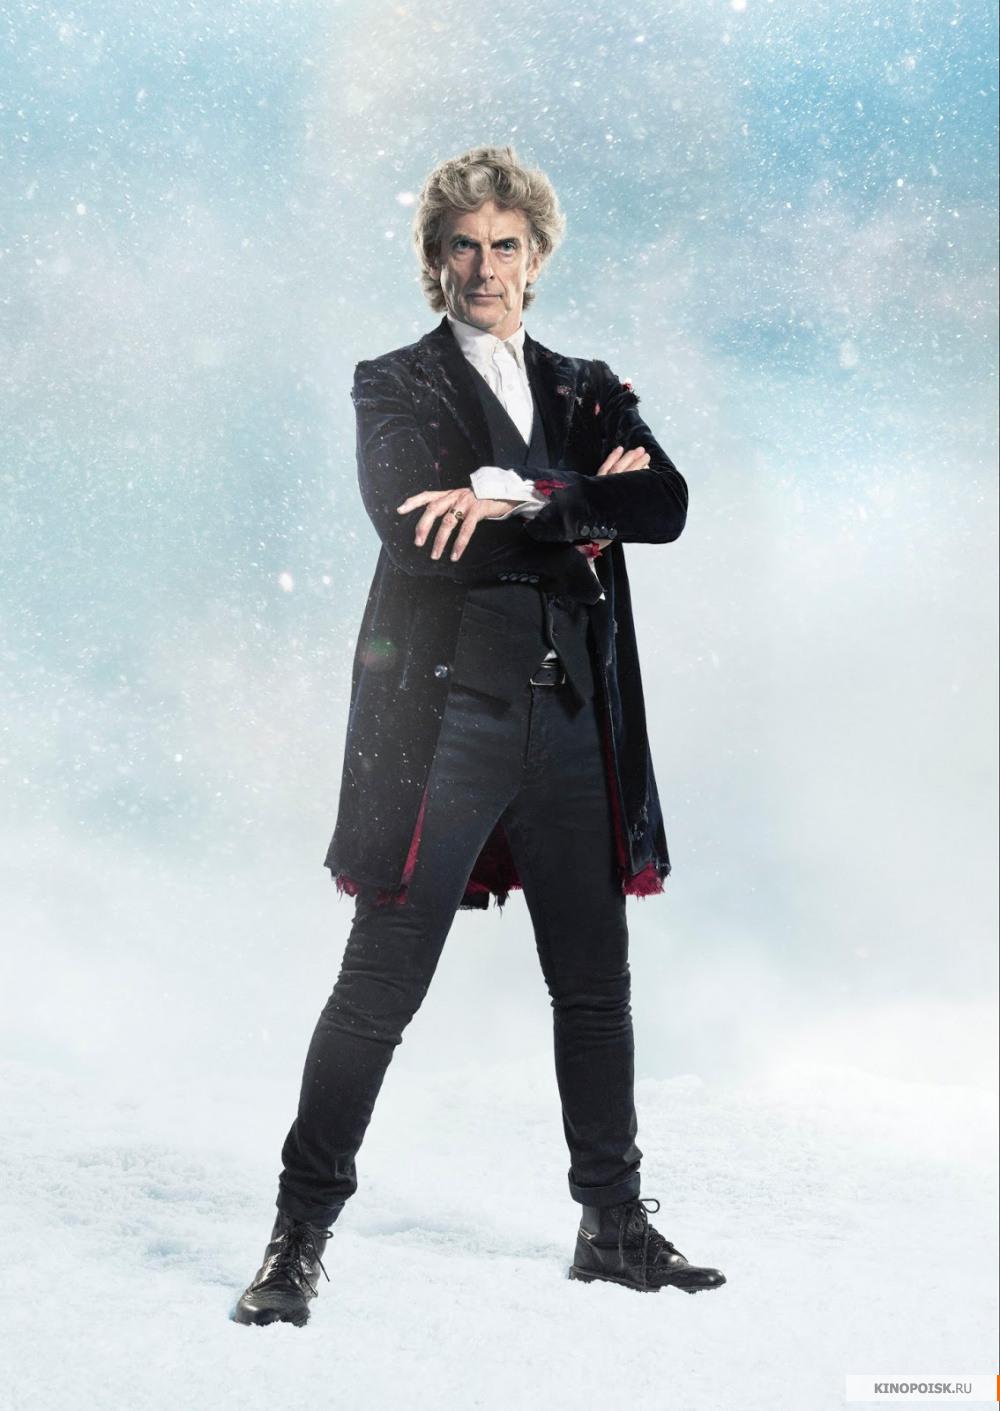 https://st.kp.yandex.net/im/kadr/3/0/9/kinopoisk.ru-Doctor-Who-3090290.jpg